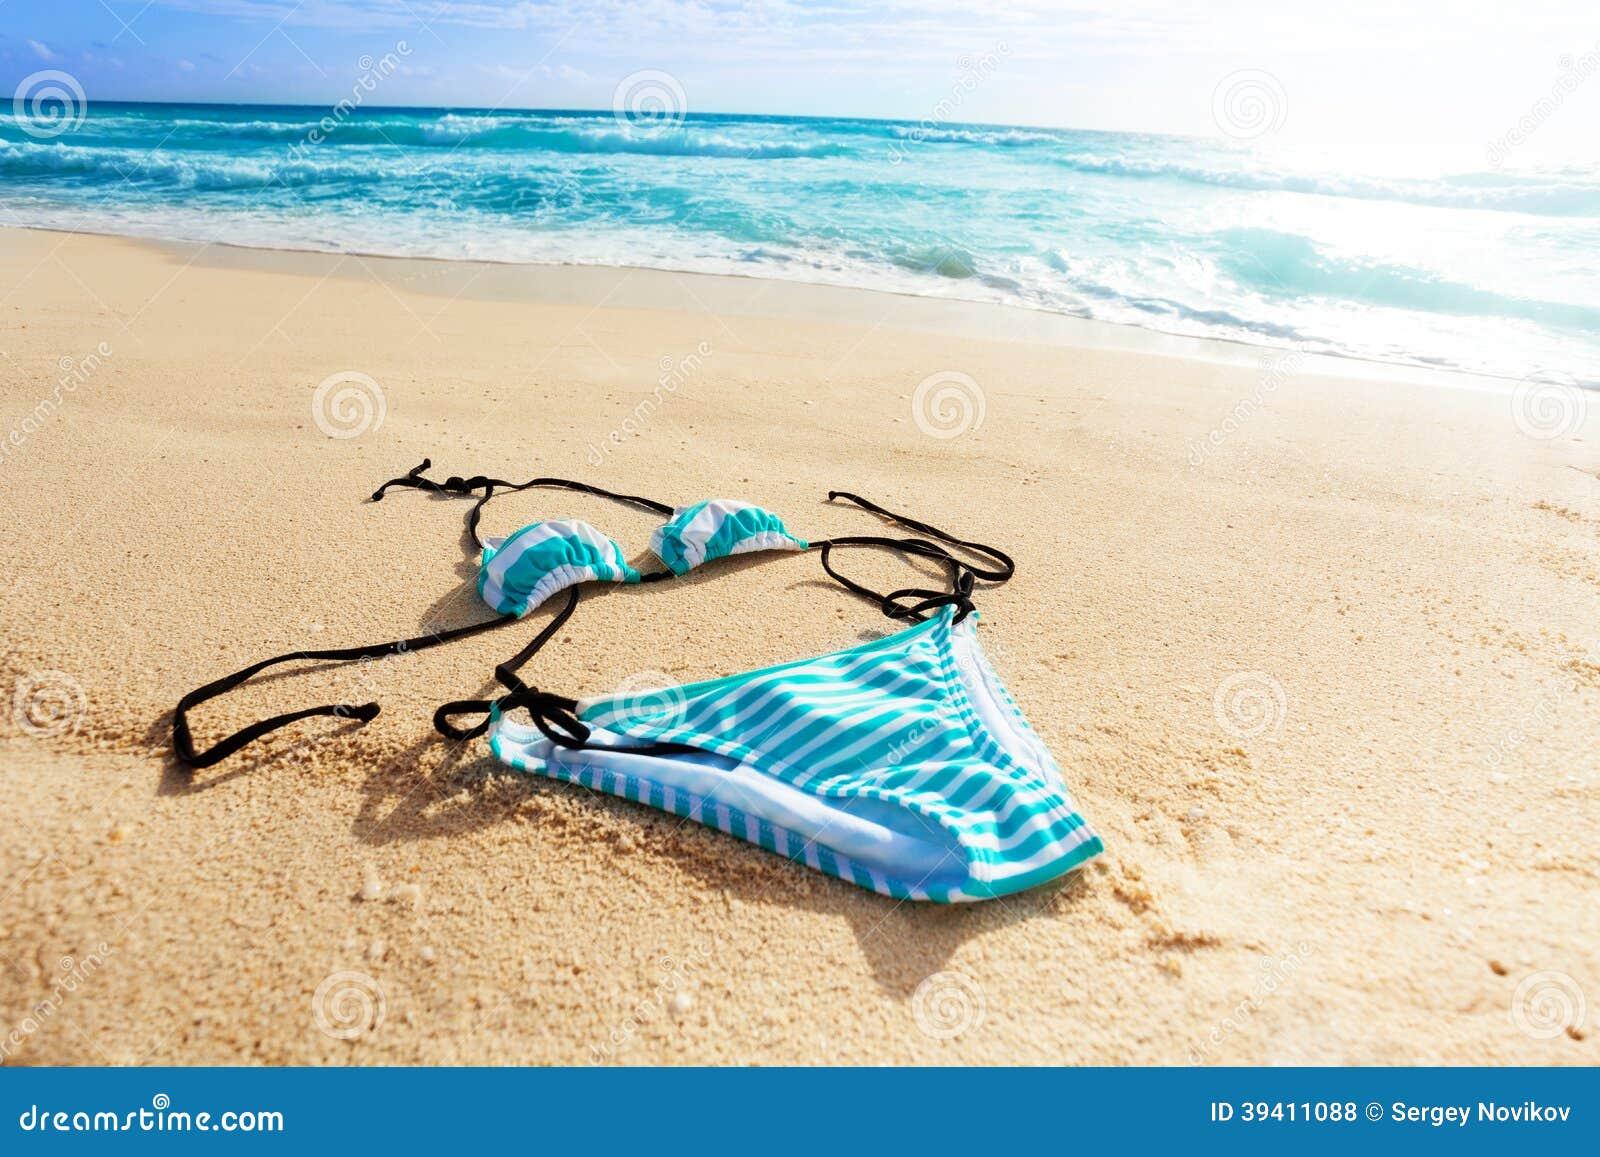 ocean and women swimsuit stock photo image 39411088 yacht clip art pic yacht clip art photos